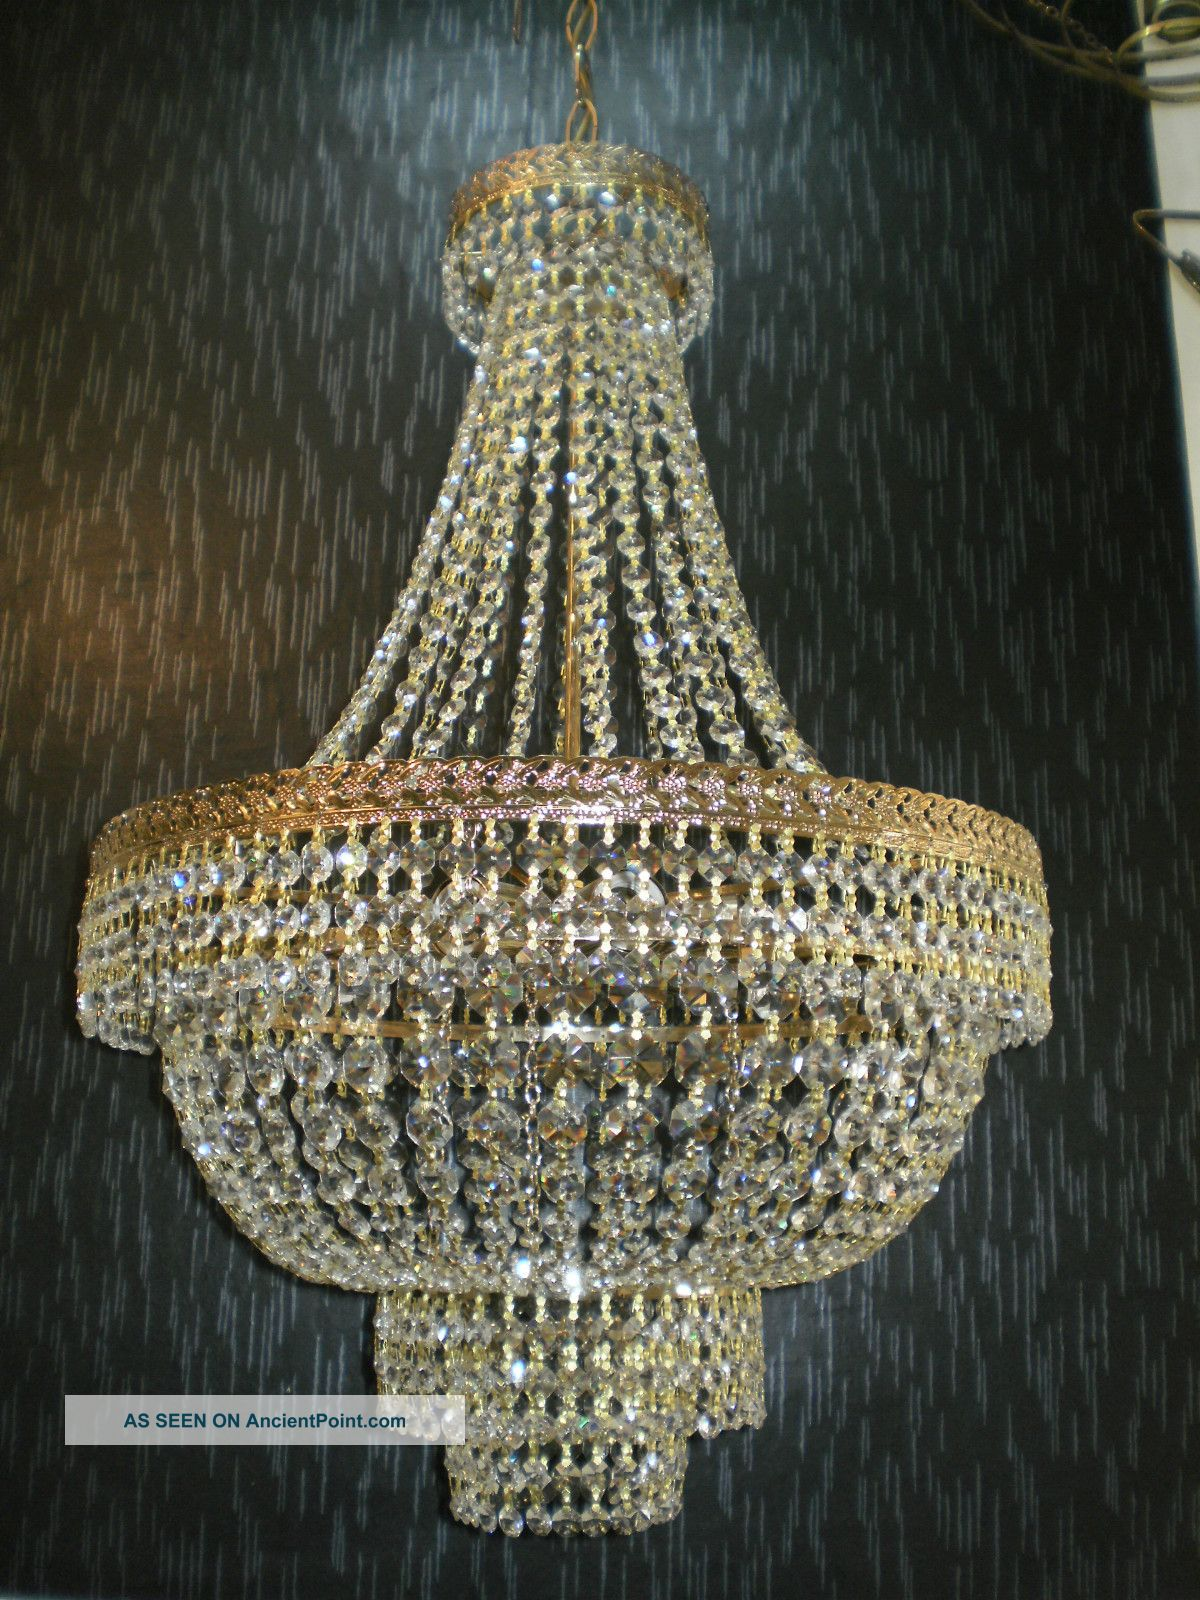 Large antique chandelier chandelier designs vintage 20 large antique brass crystal chandelier lighting arubaitofo Image collections